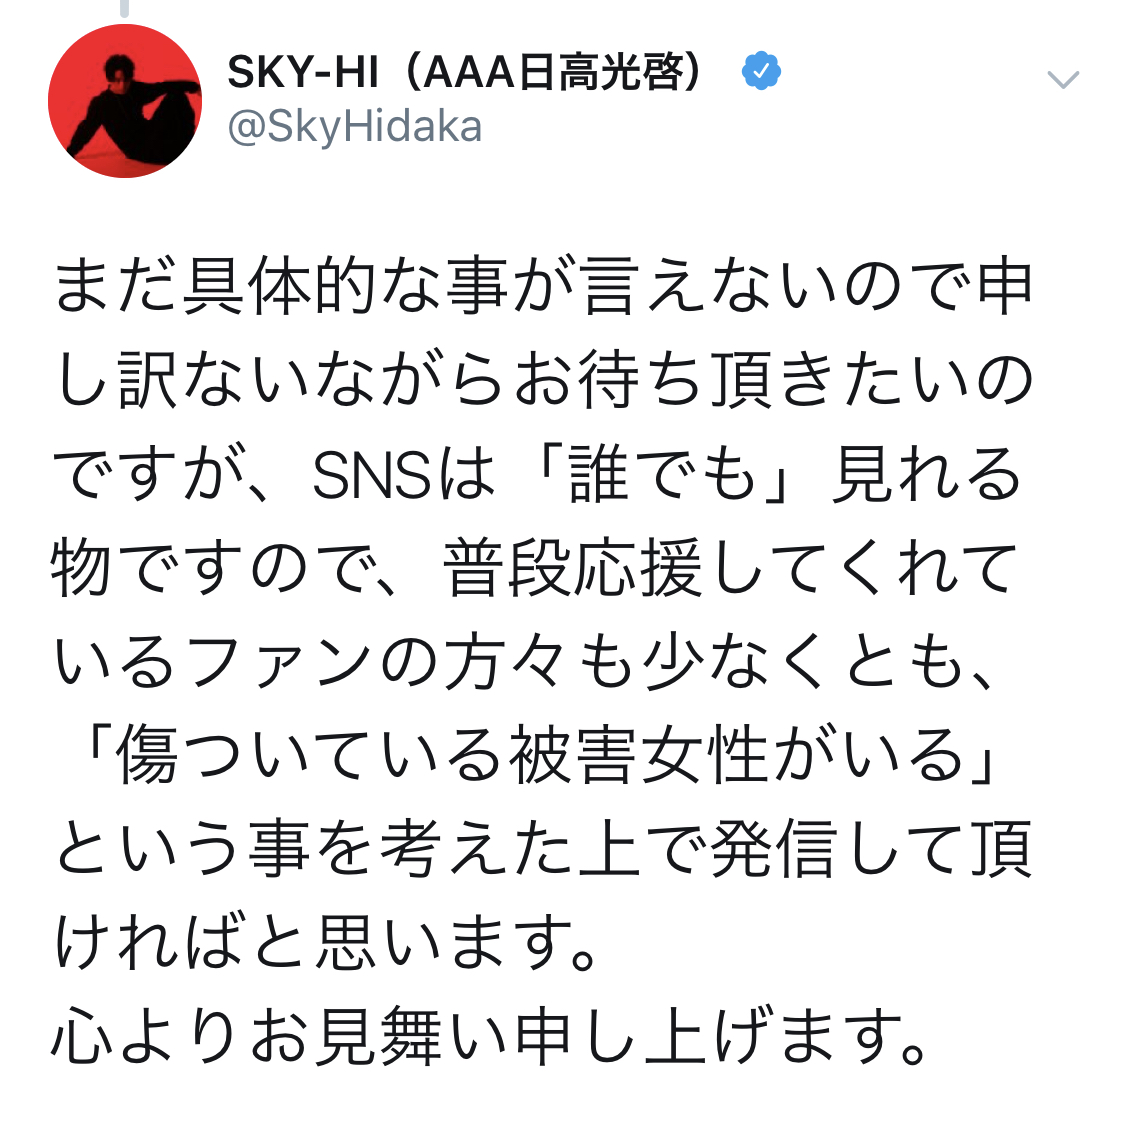 AAA浦田直也の暴行事件に対してメンバーのコメント